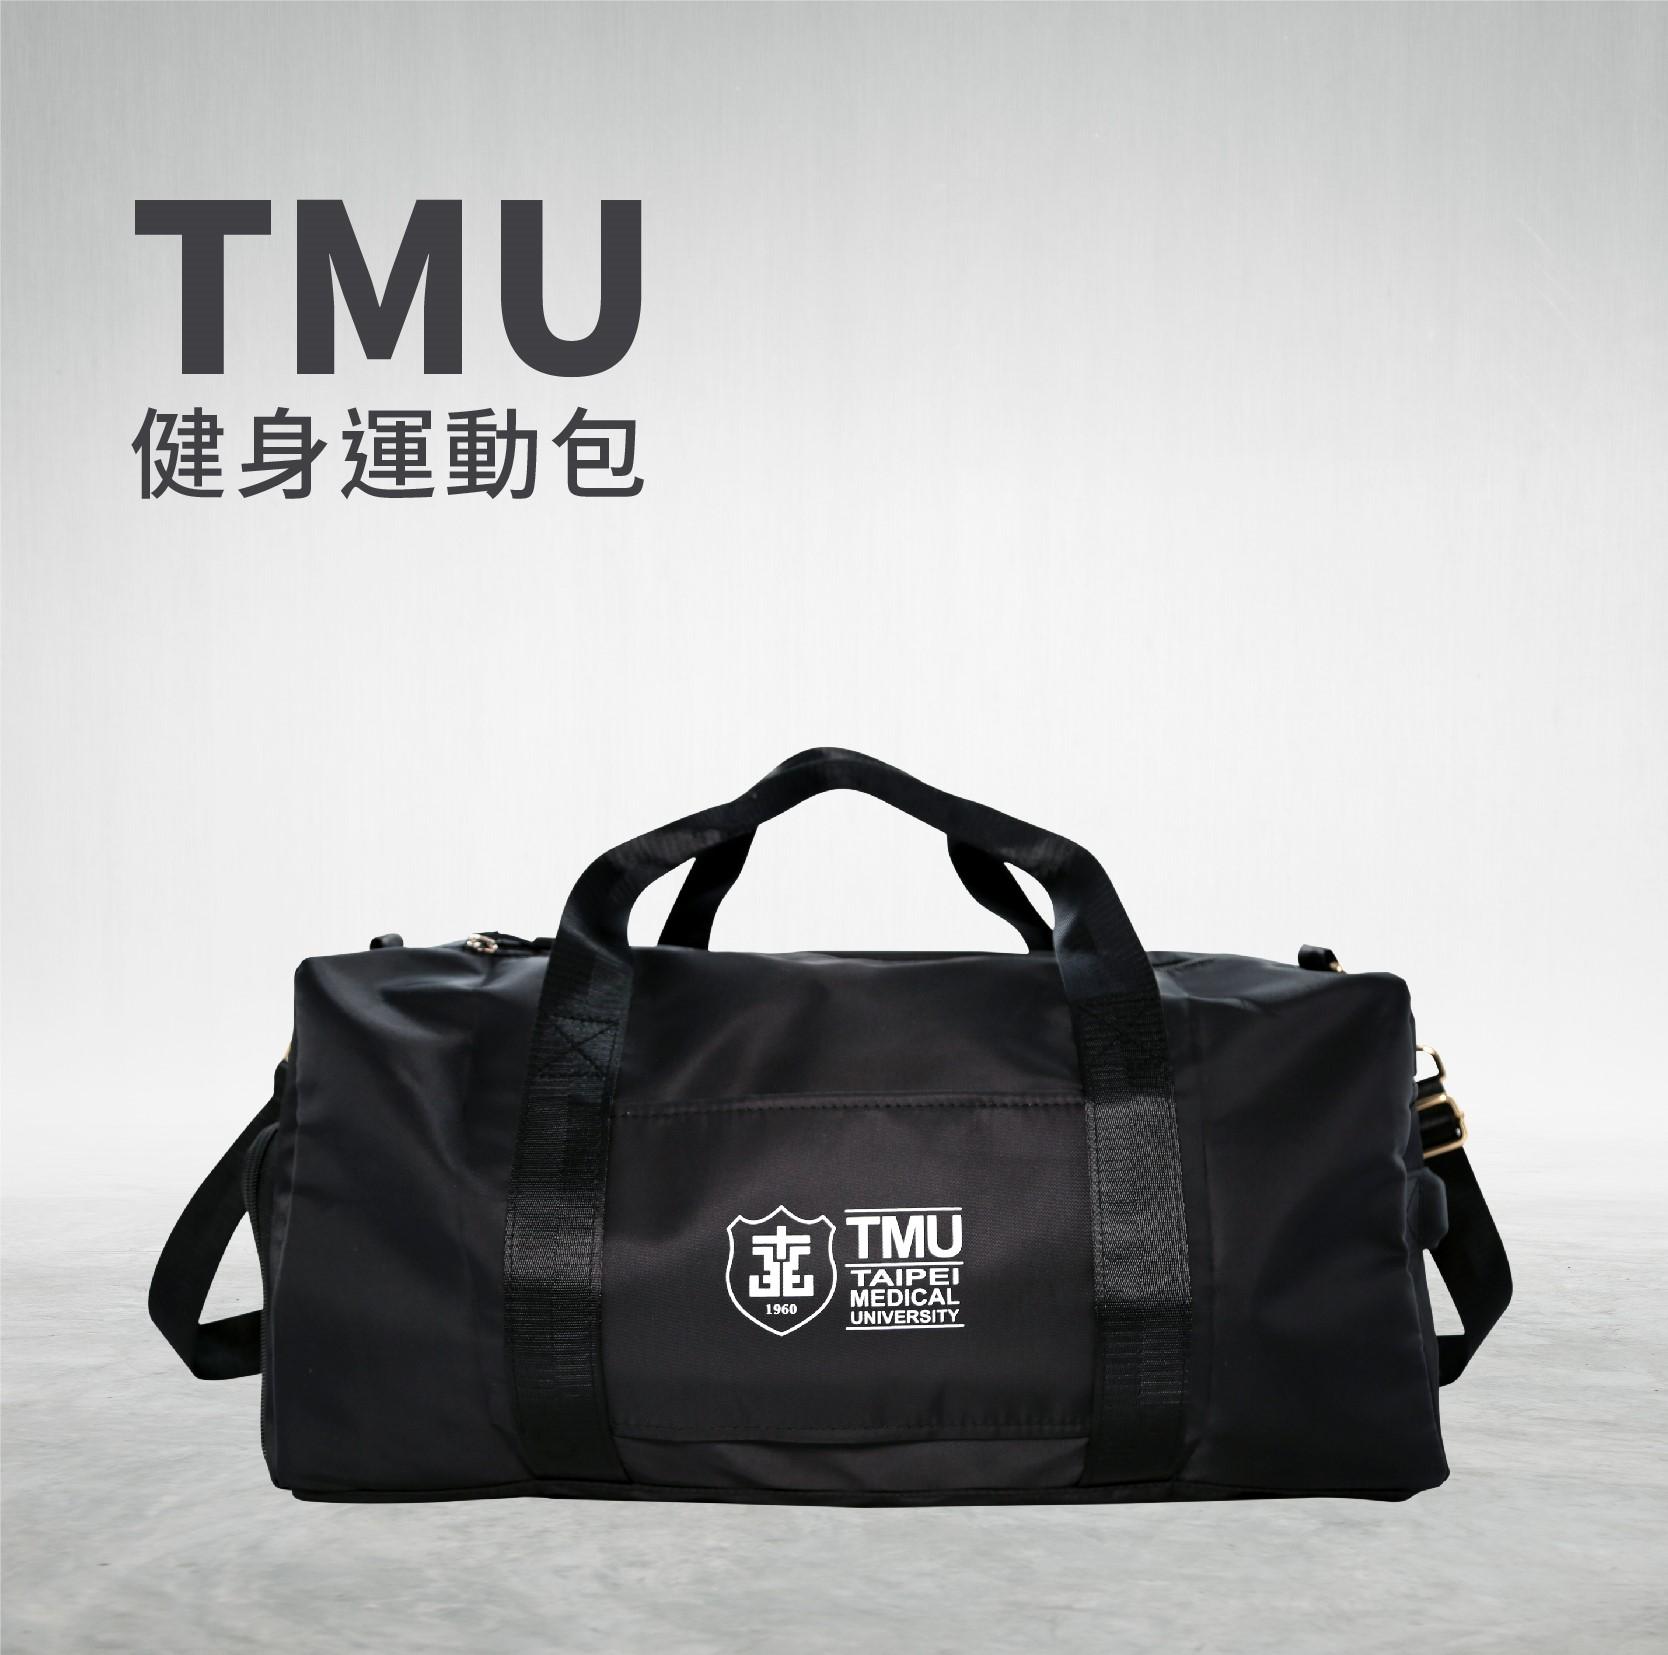 TMU 健身運動包